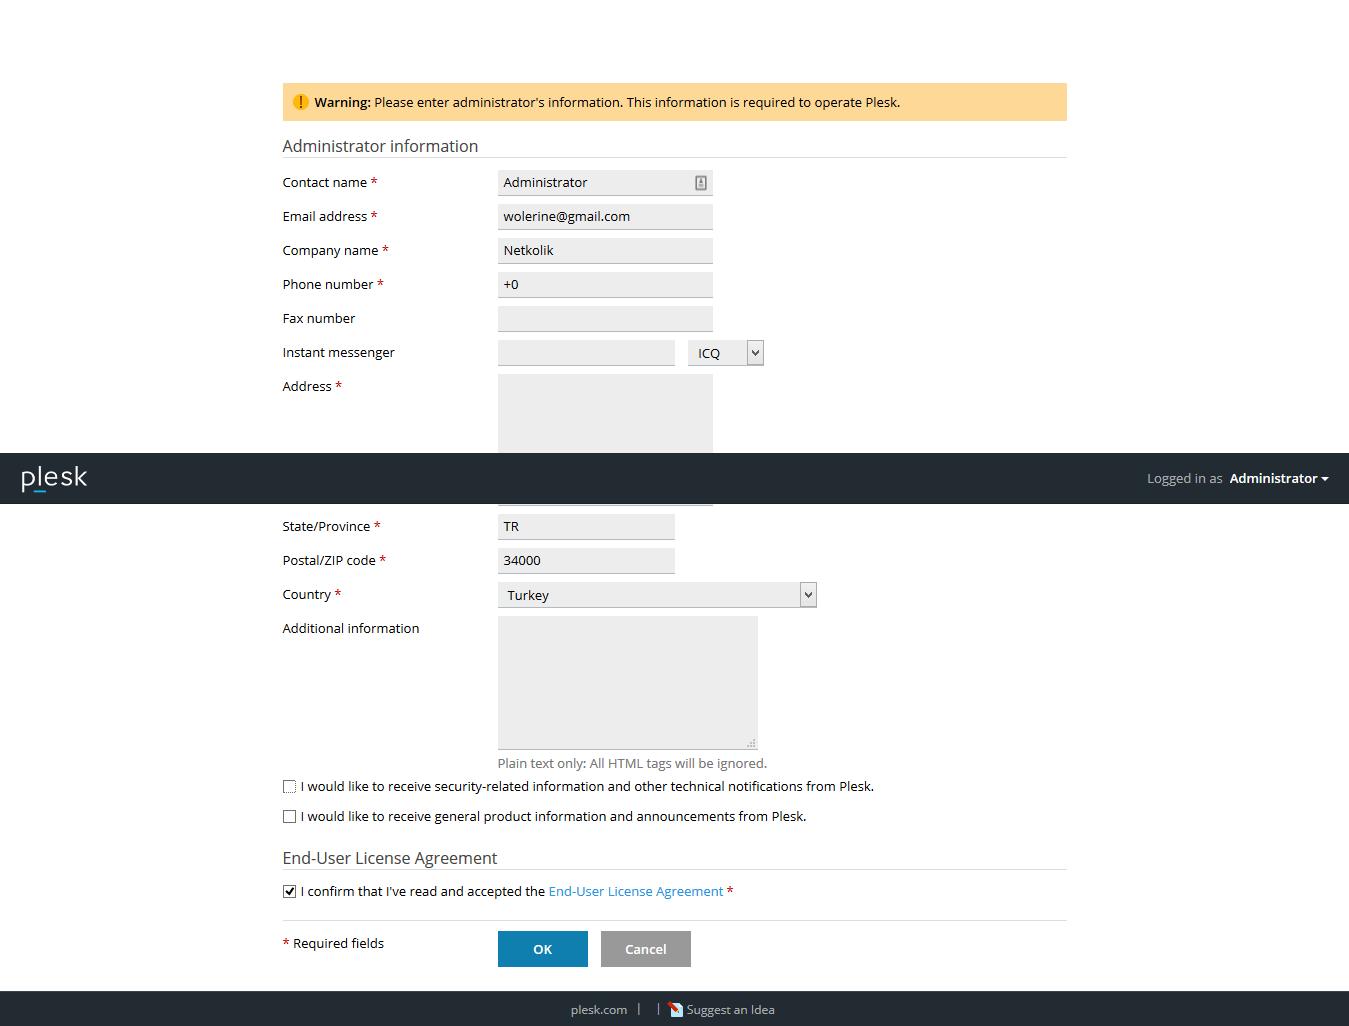 Plesk Onyx Admin Information